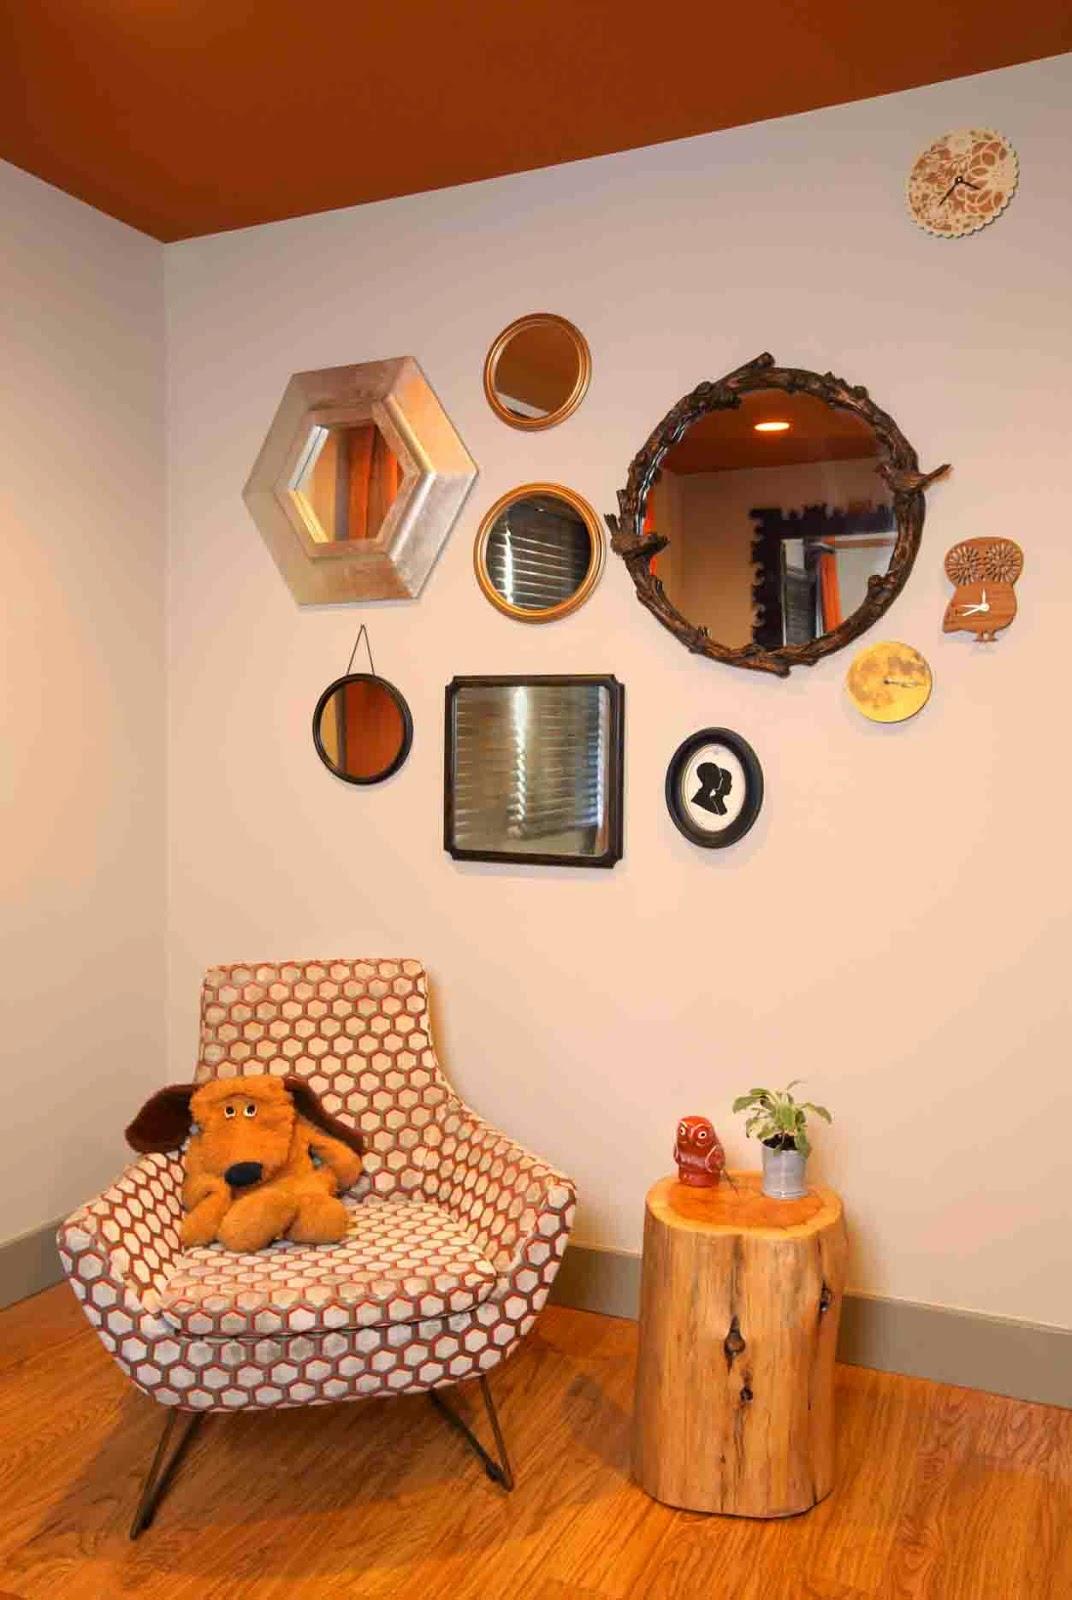 wood.nightstand.organic.design.modern.chair